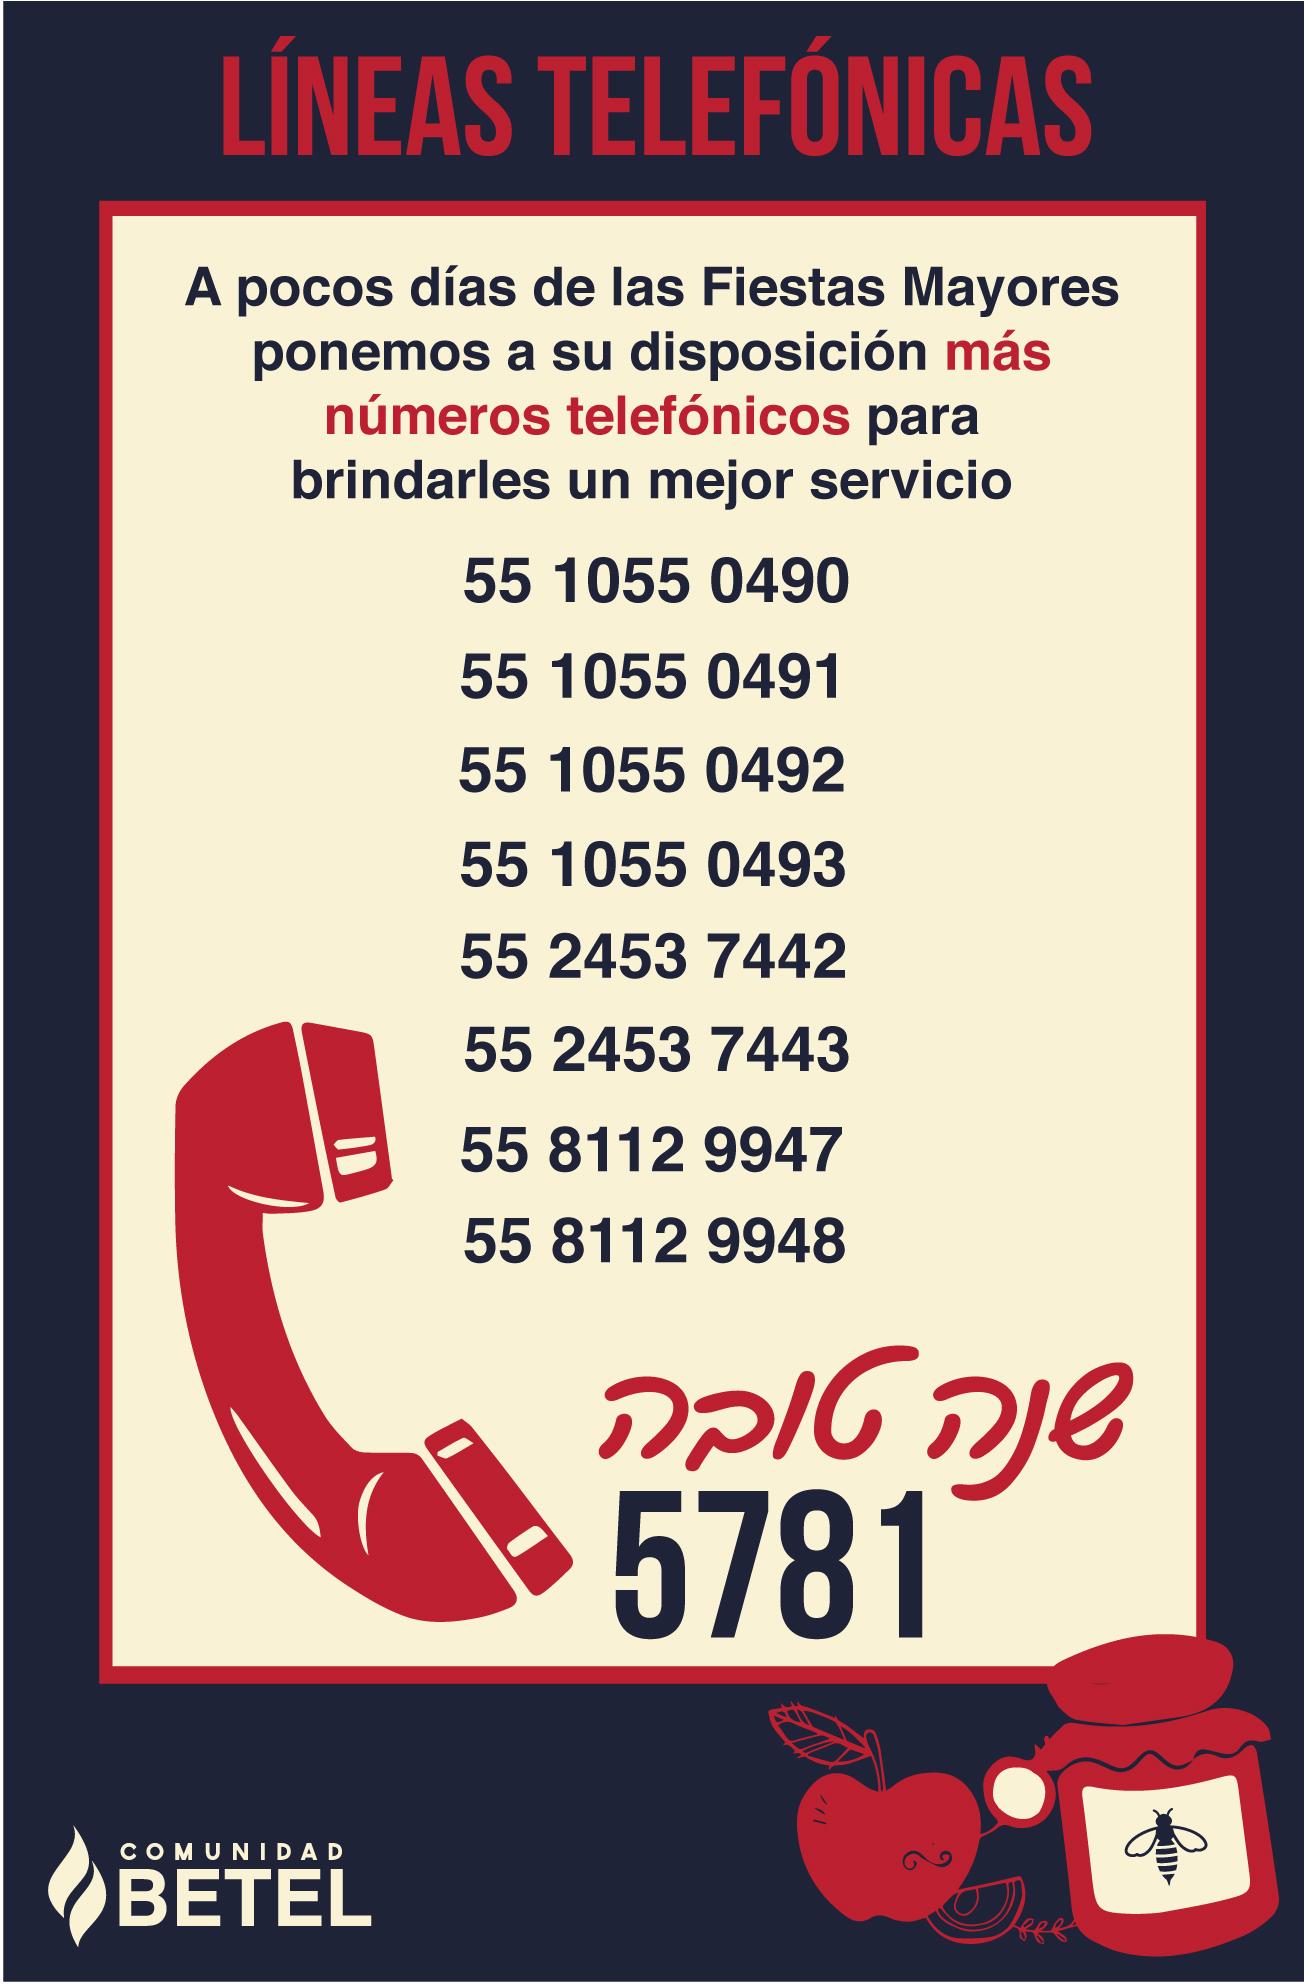 Líneas telefónicas